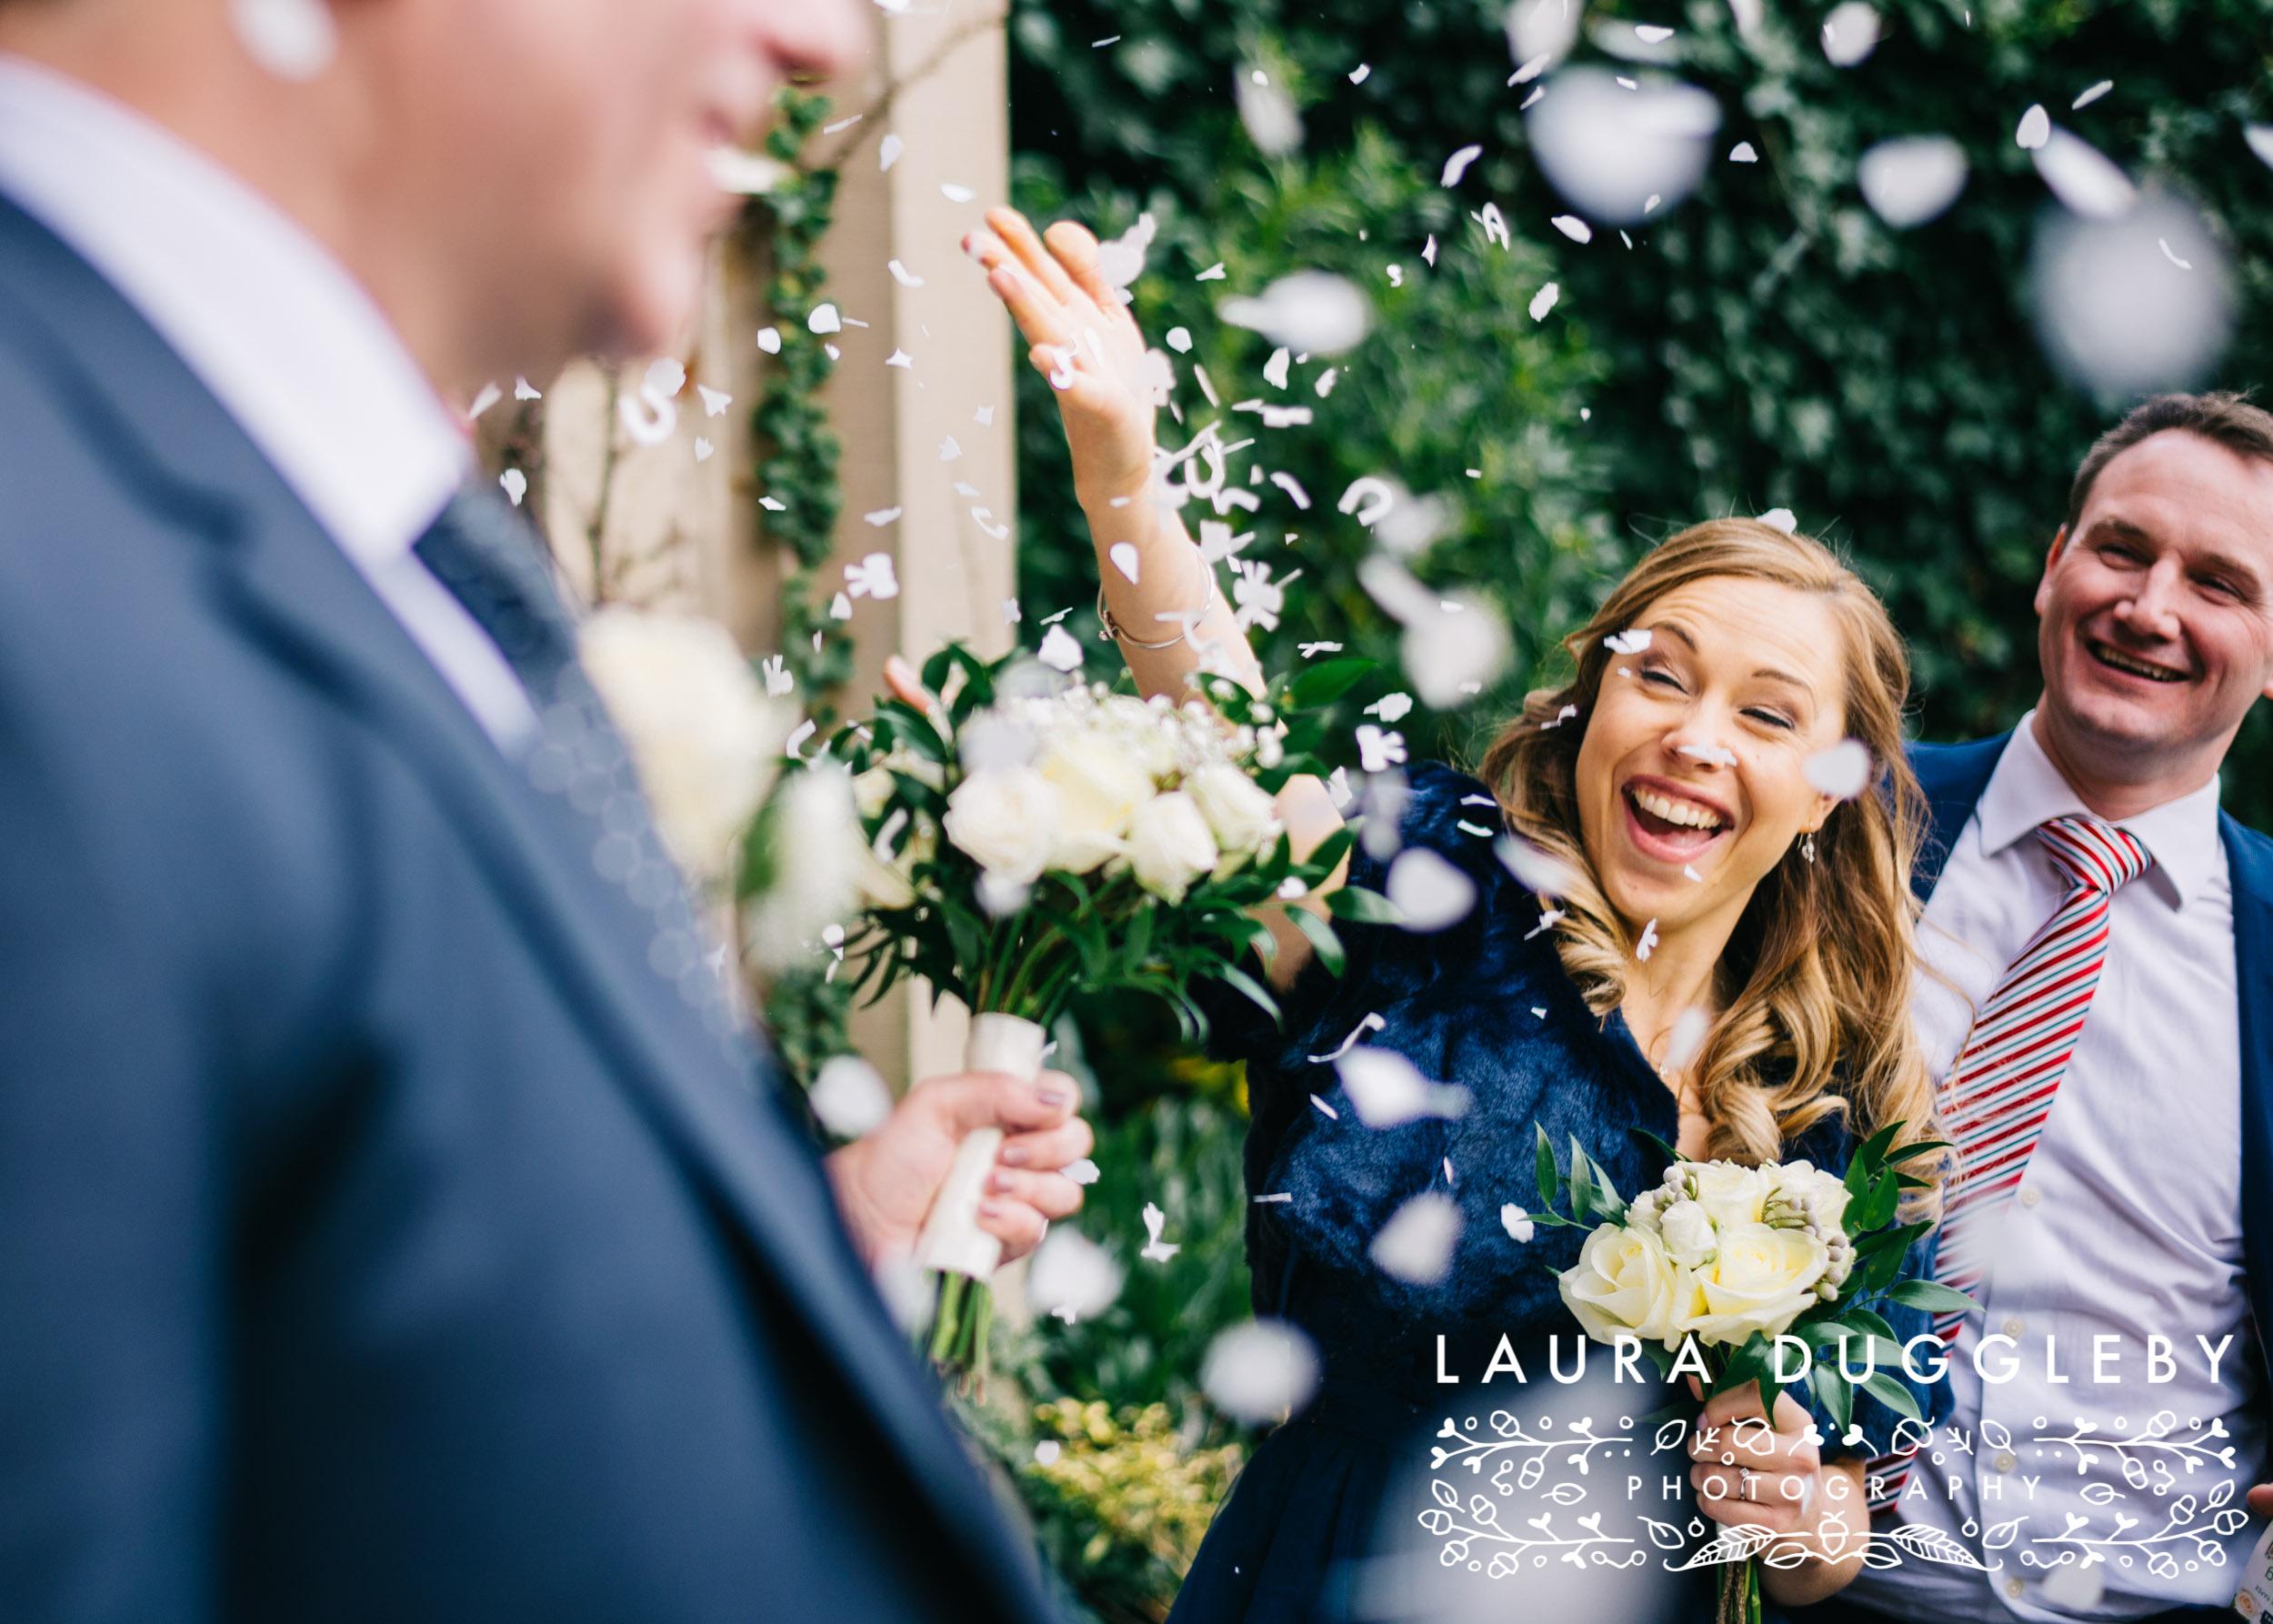 The Villa Hotel - Wrea Green Lancashire Wedding Photographer13